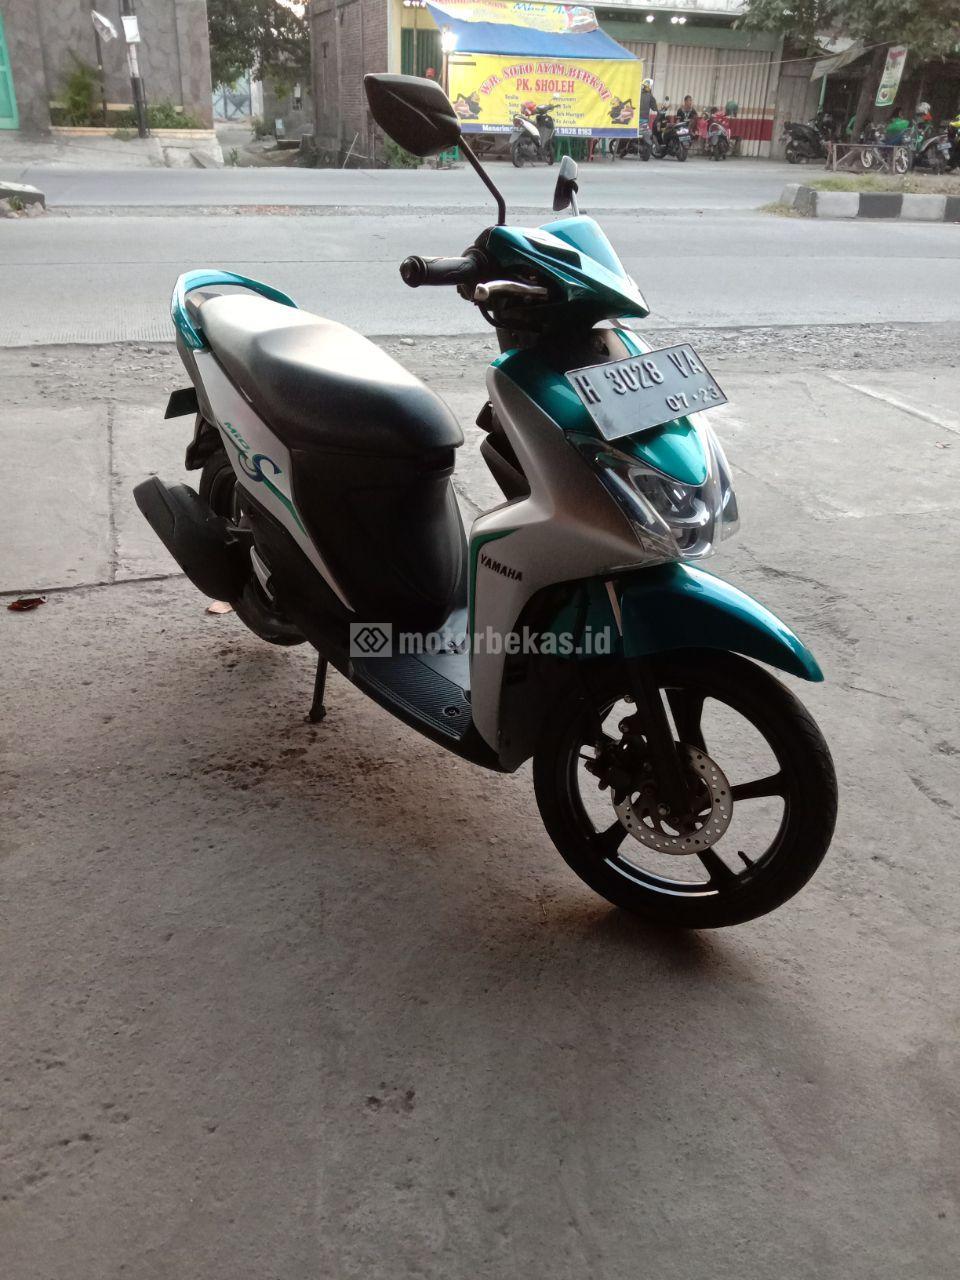 YAMAHA MIO S  3333 motorbekas.id